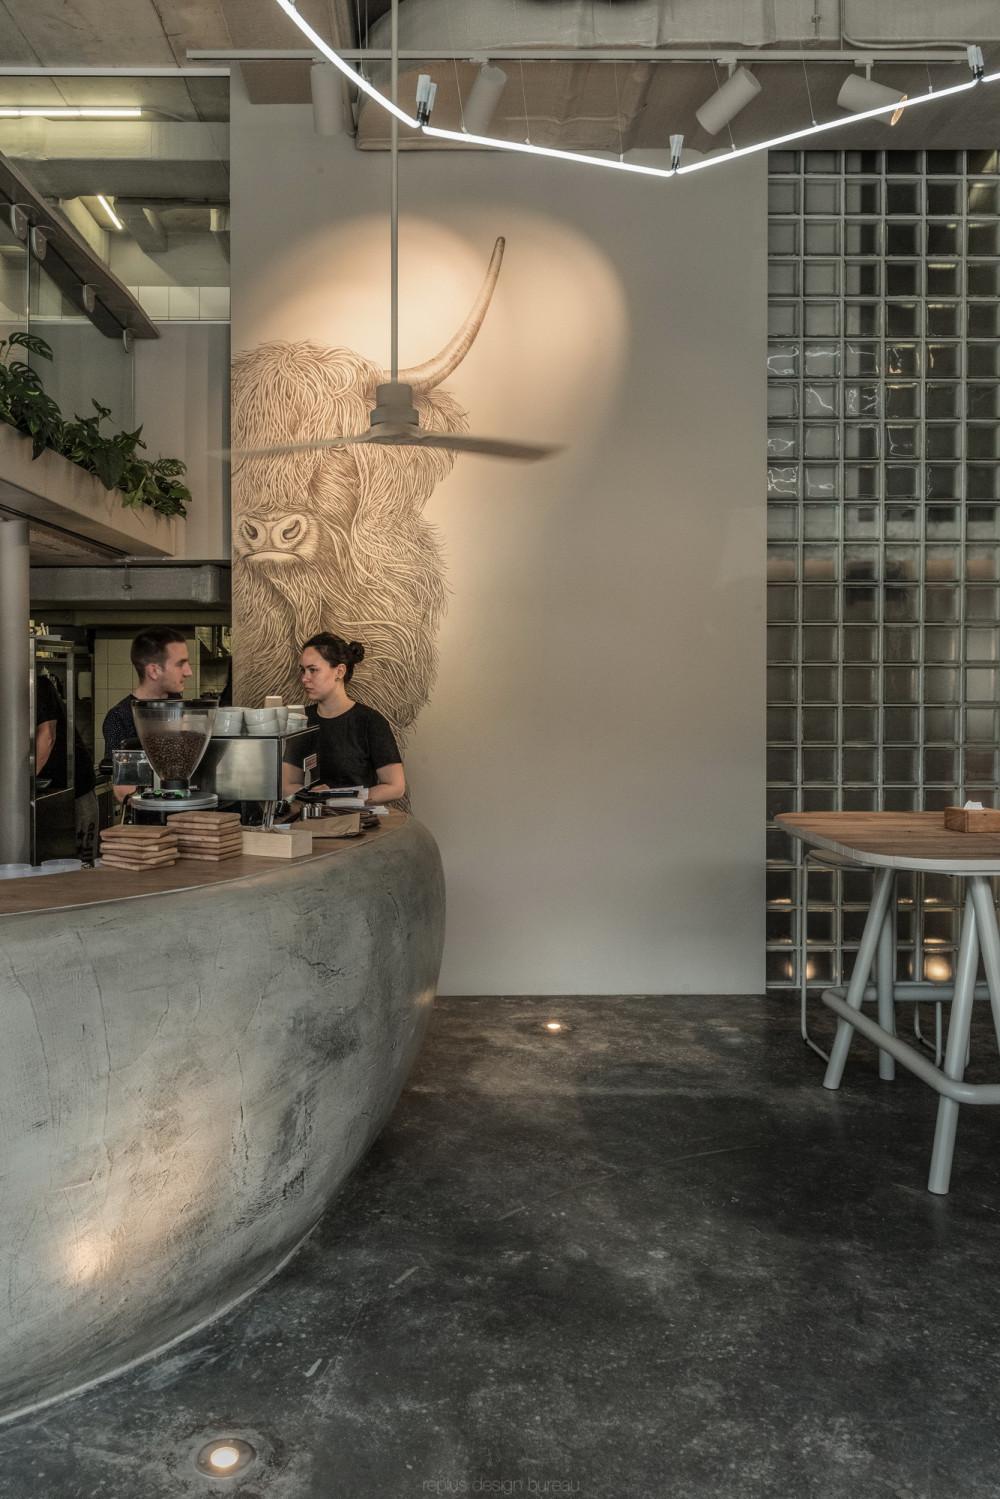 replus design bureau 设计 | OM NOM NOM 素食咖啡馆